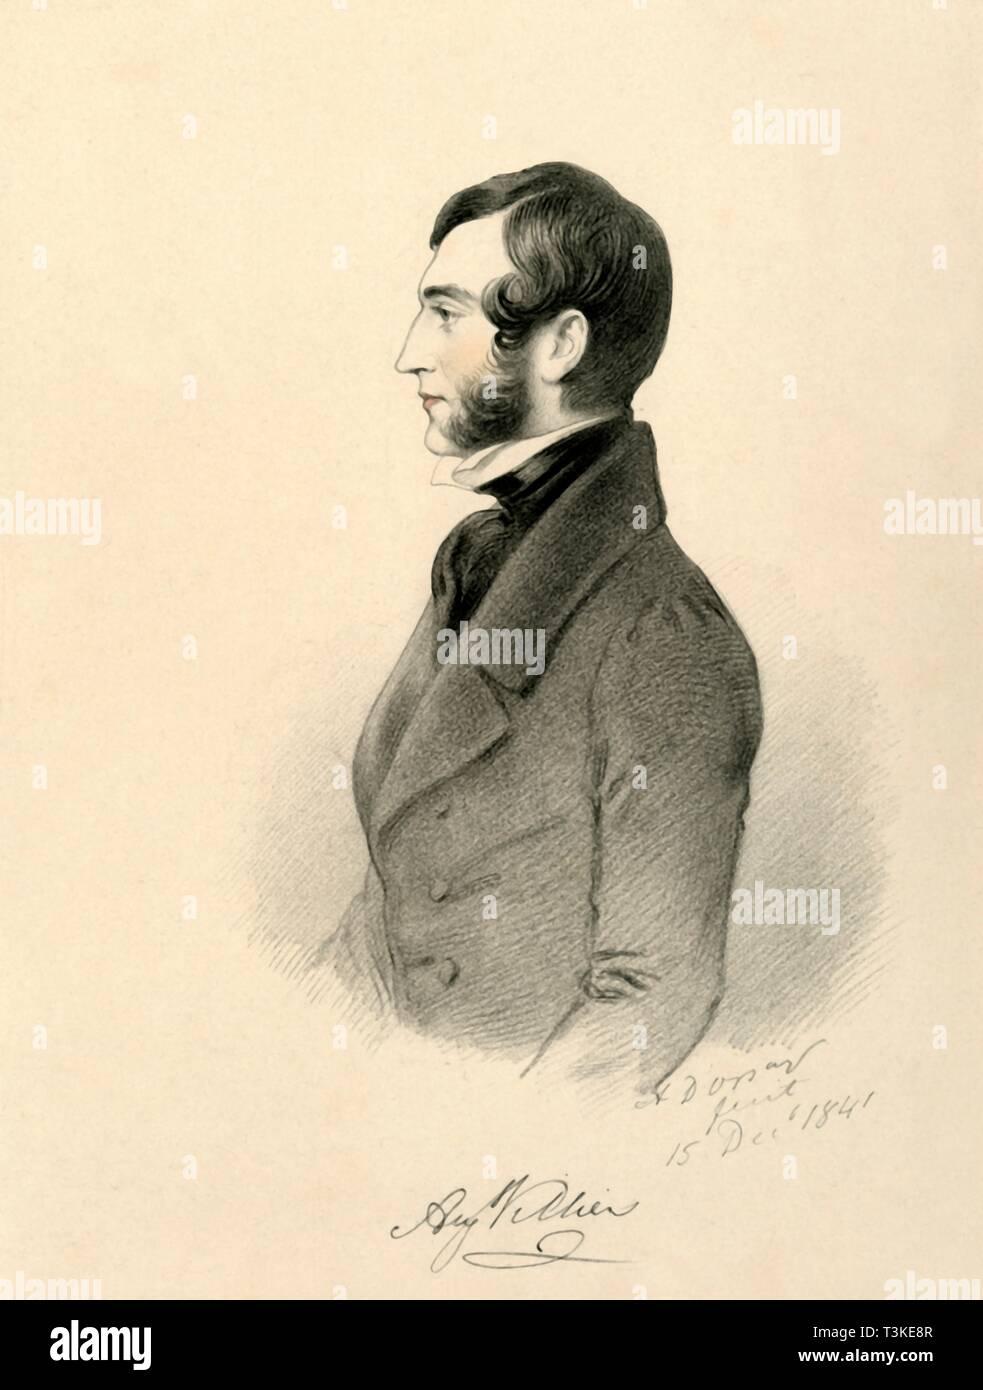 'Augustus Villiers', 1841. Creator: Richard James Lane. - Stock Image